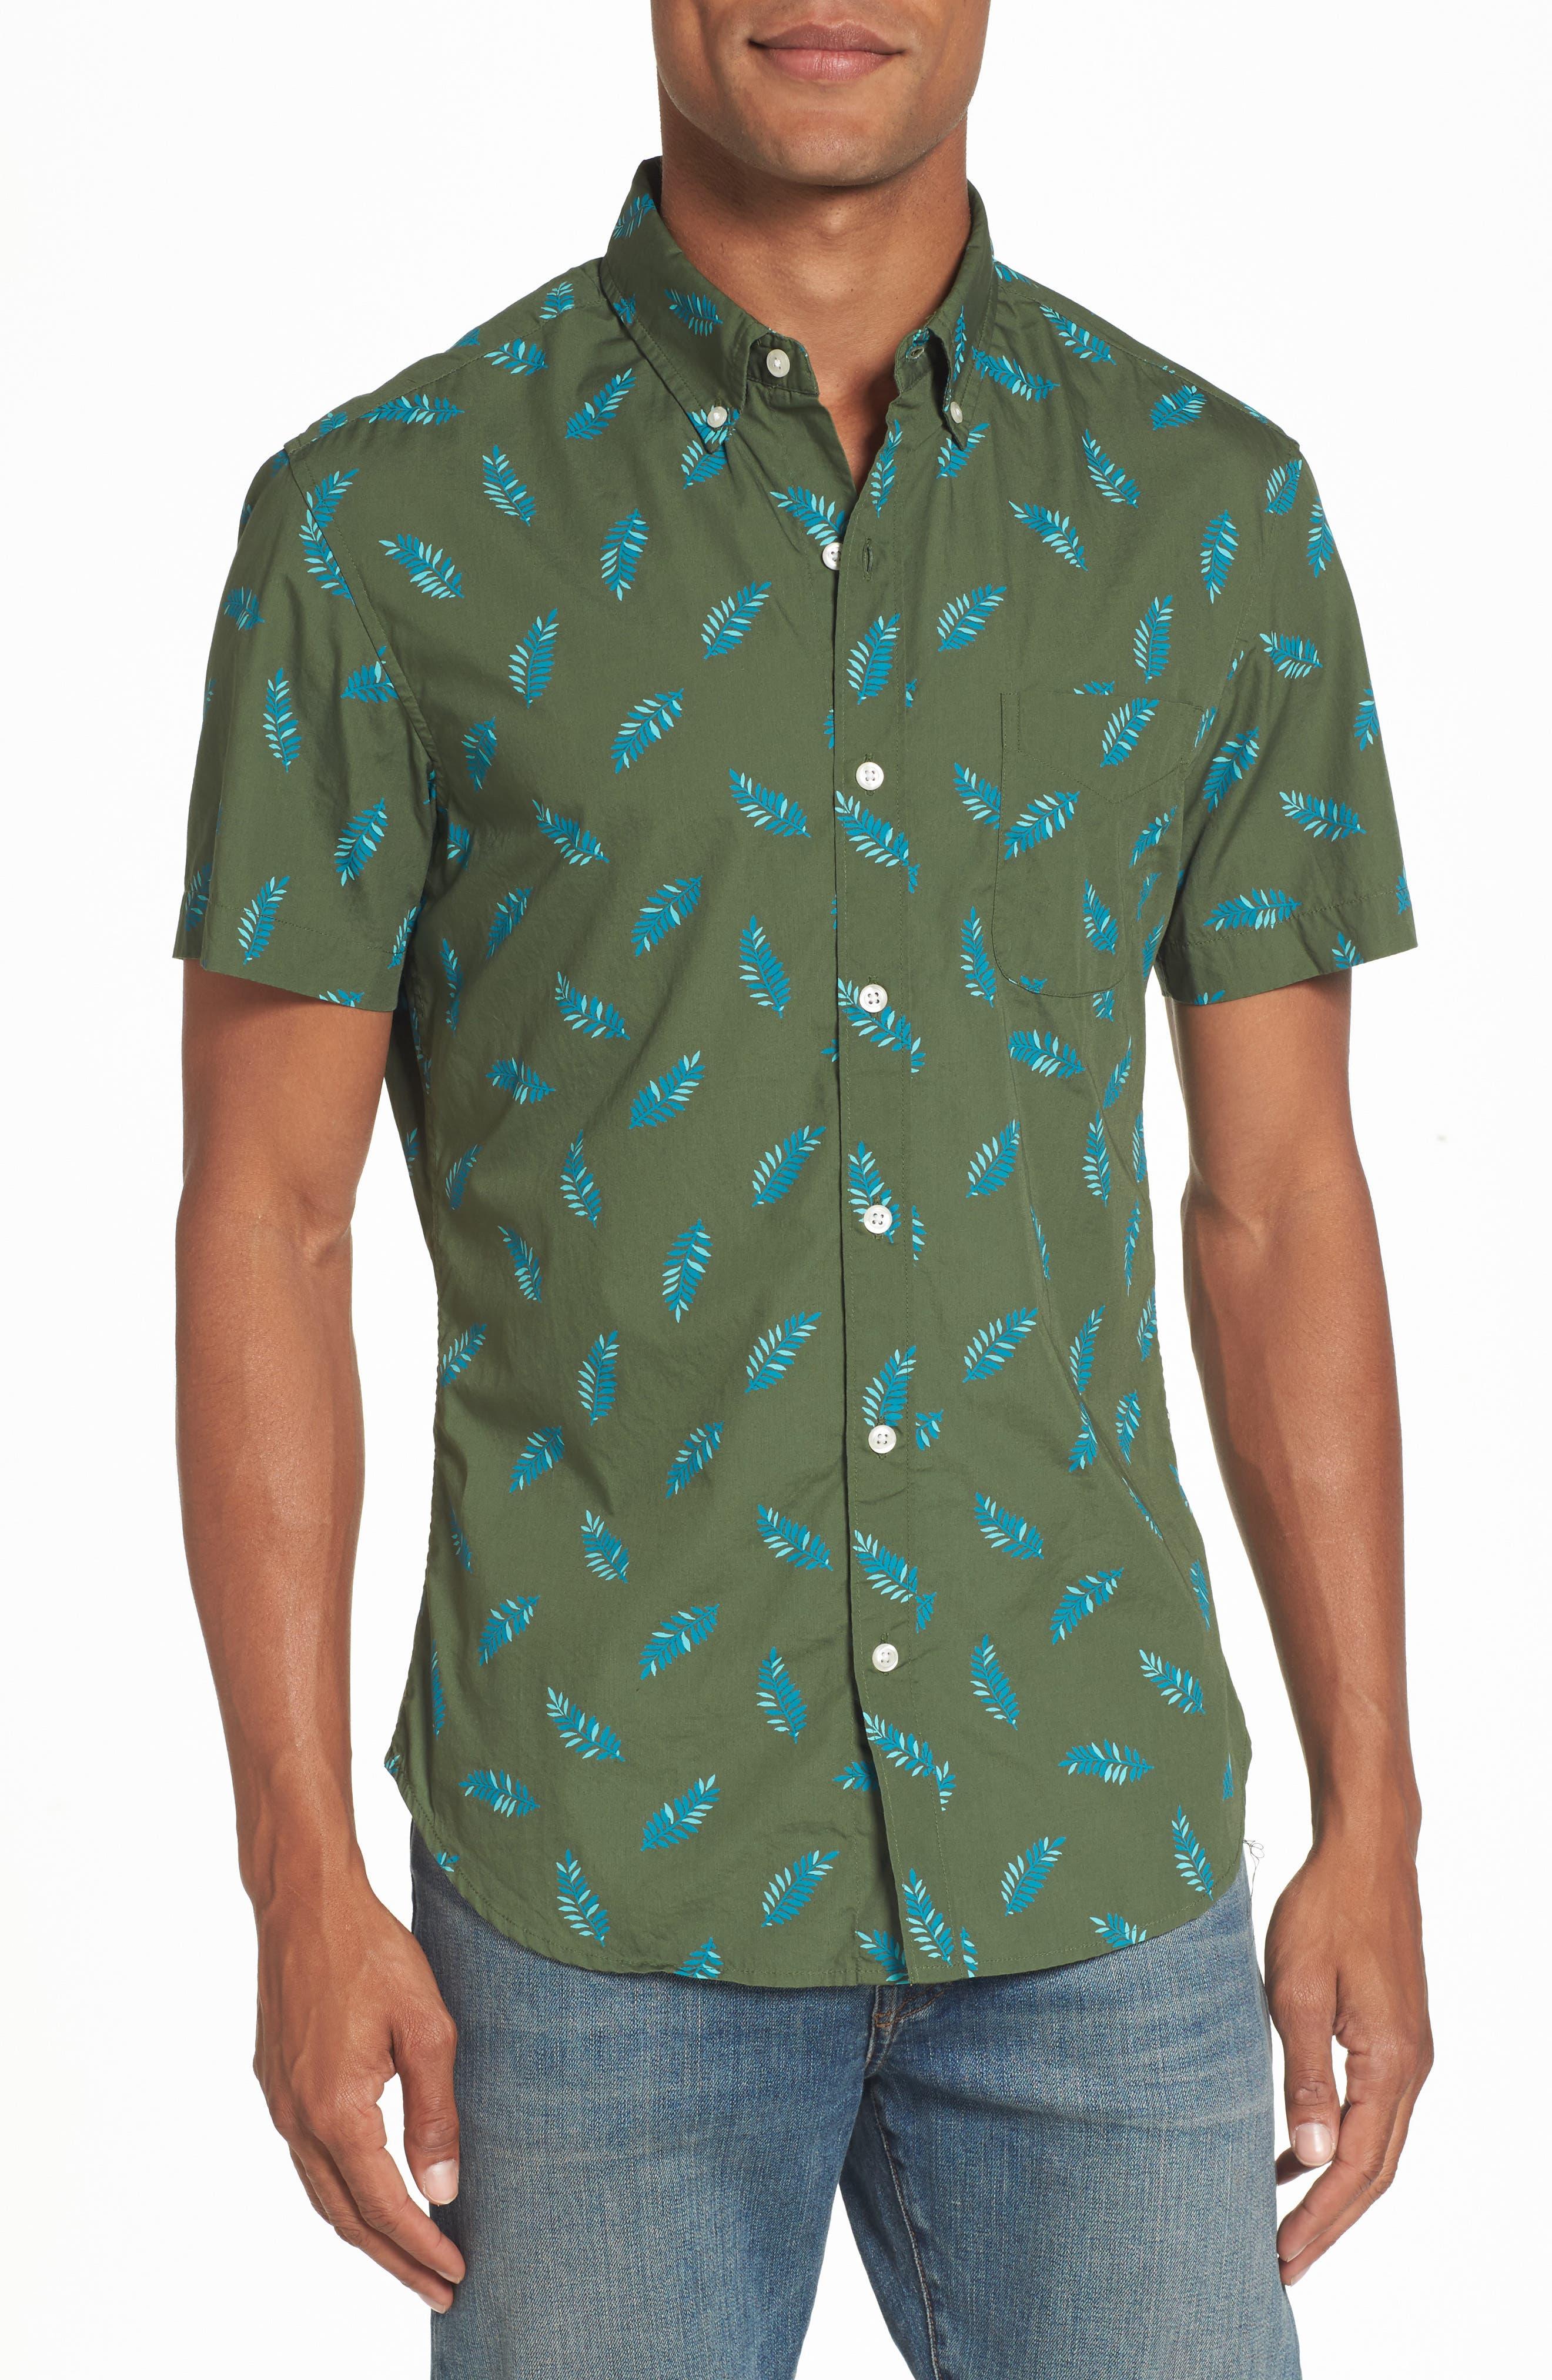 Riviera Fern Print Woven Shirt,                             Main thumbnail 1, color,                             300